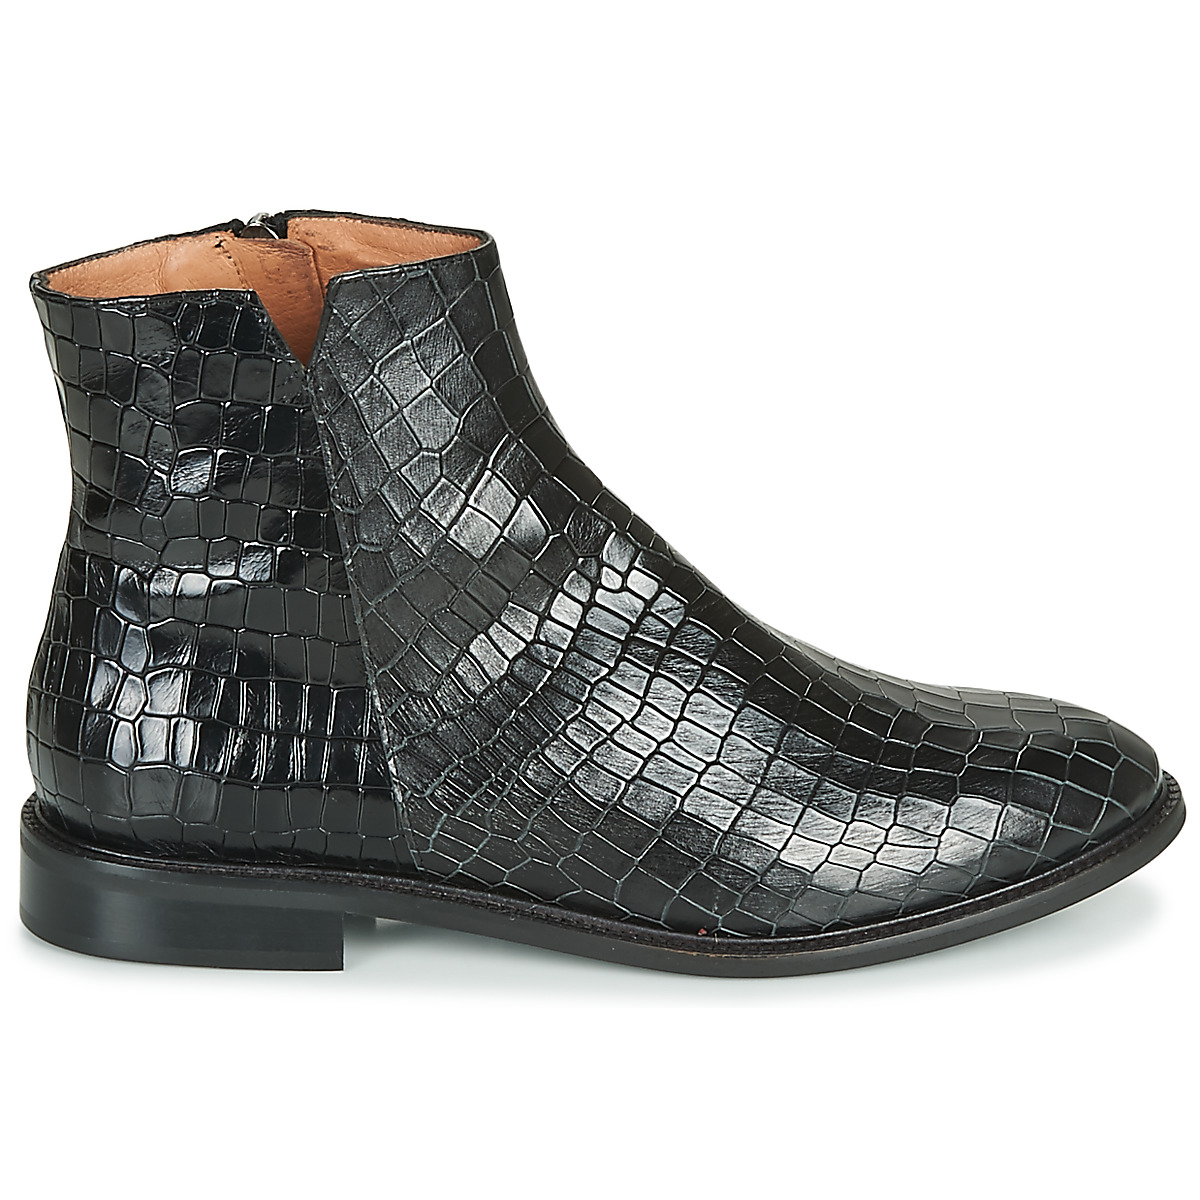 Fericelli Boots Boots Fericelli Lanaelle Lanaelle Fericelli Boots gyfb67